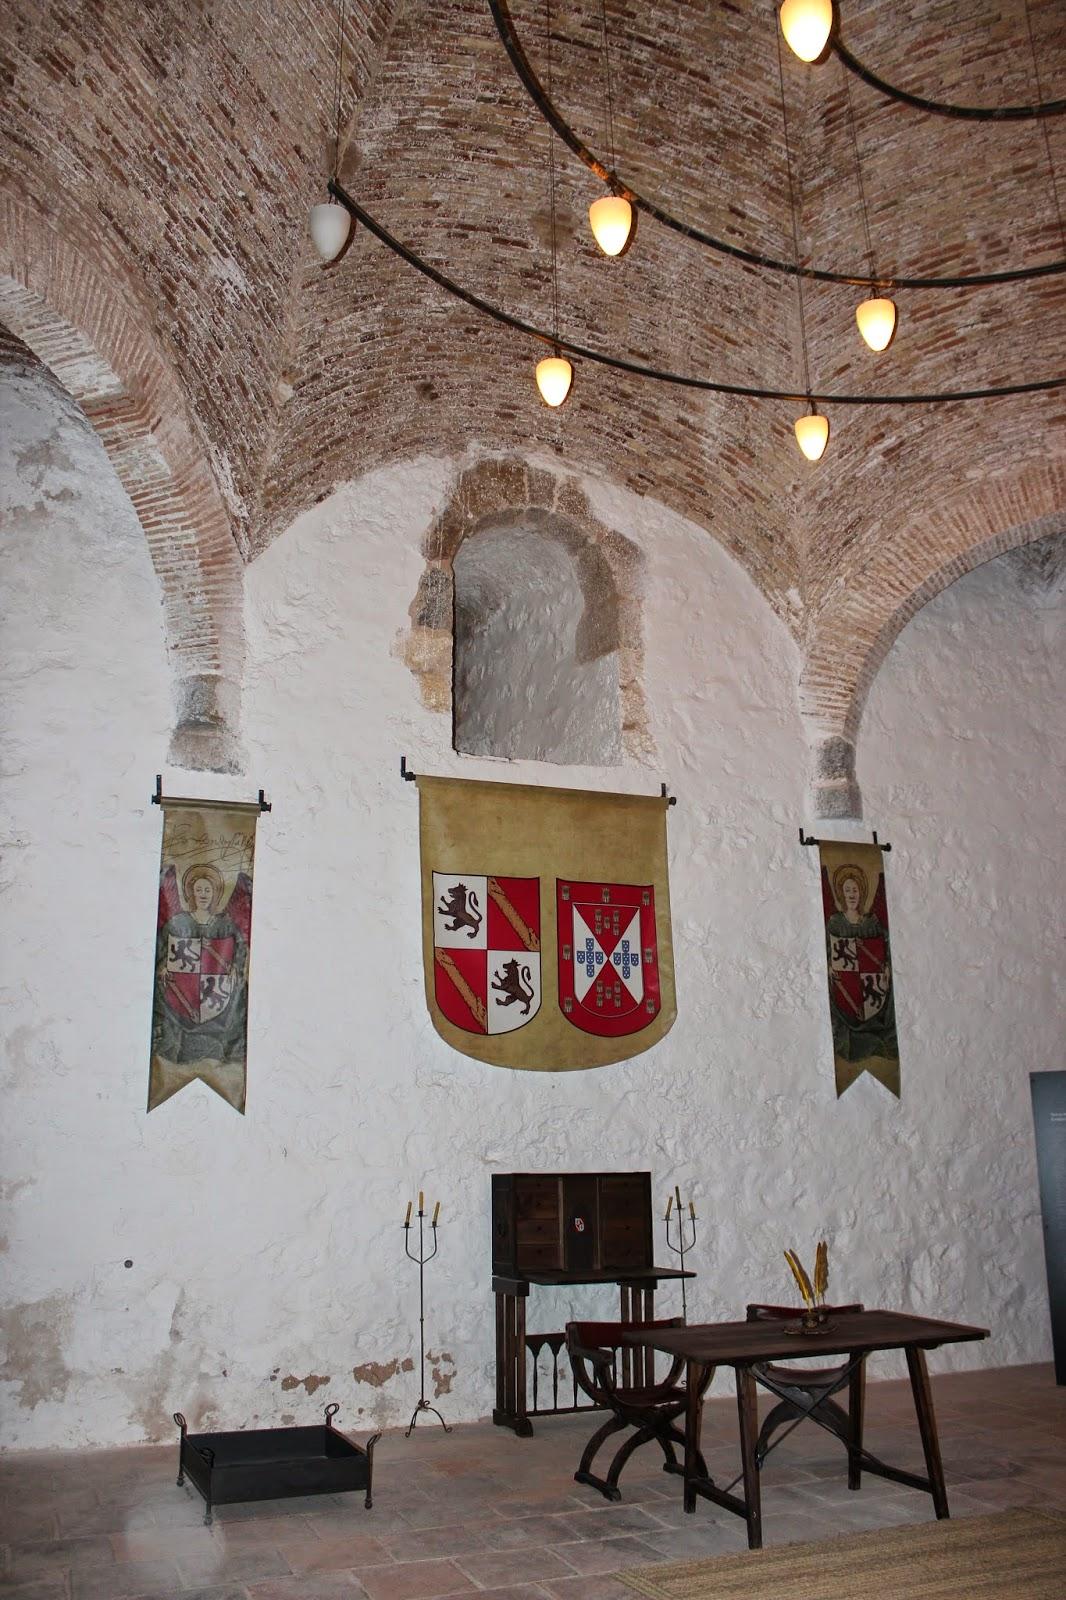 Interior de la Torre Homenaje del Castillo de Santa Catalina